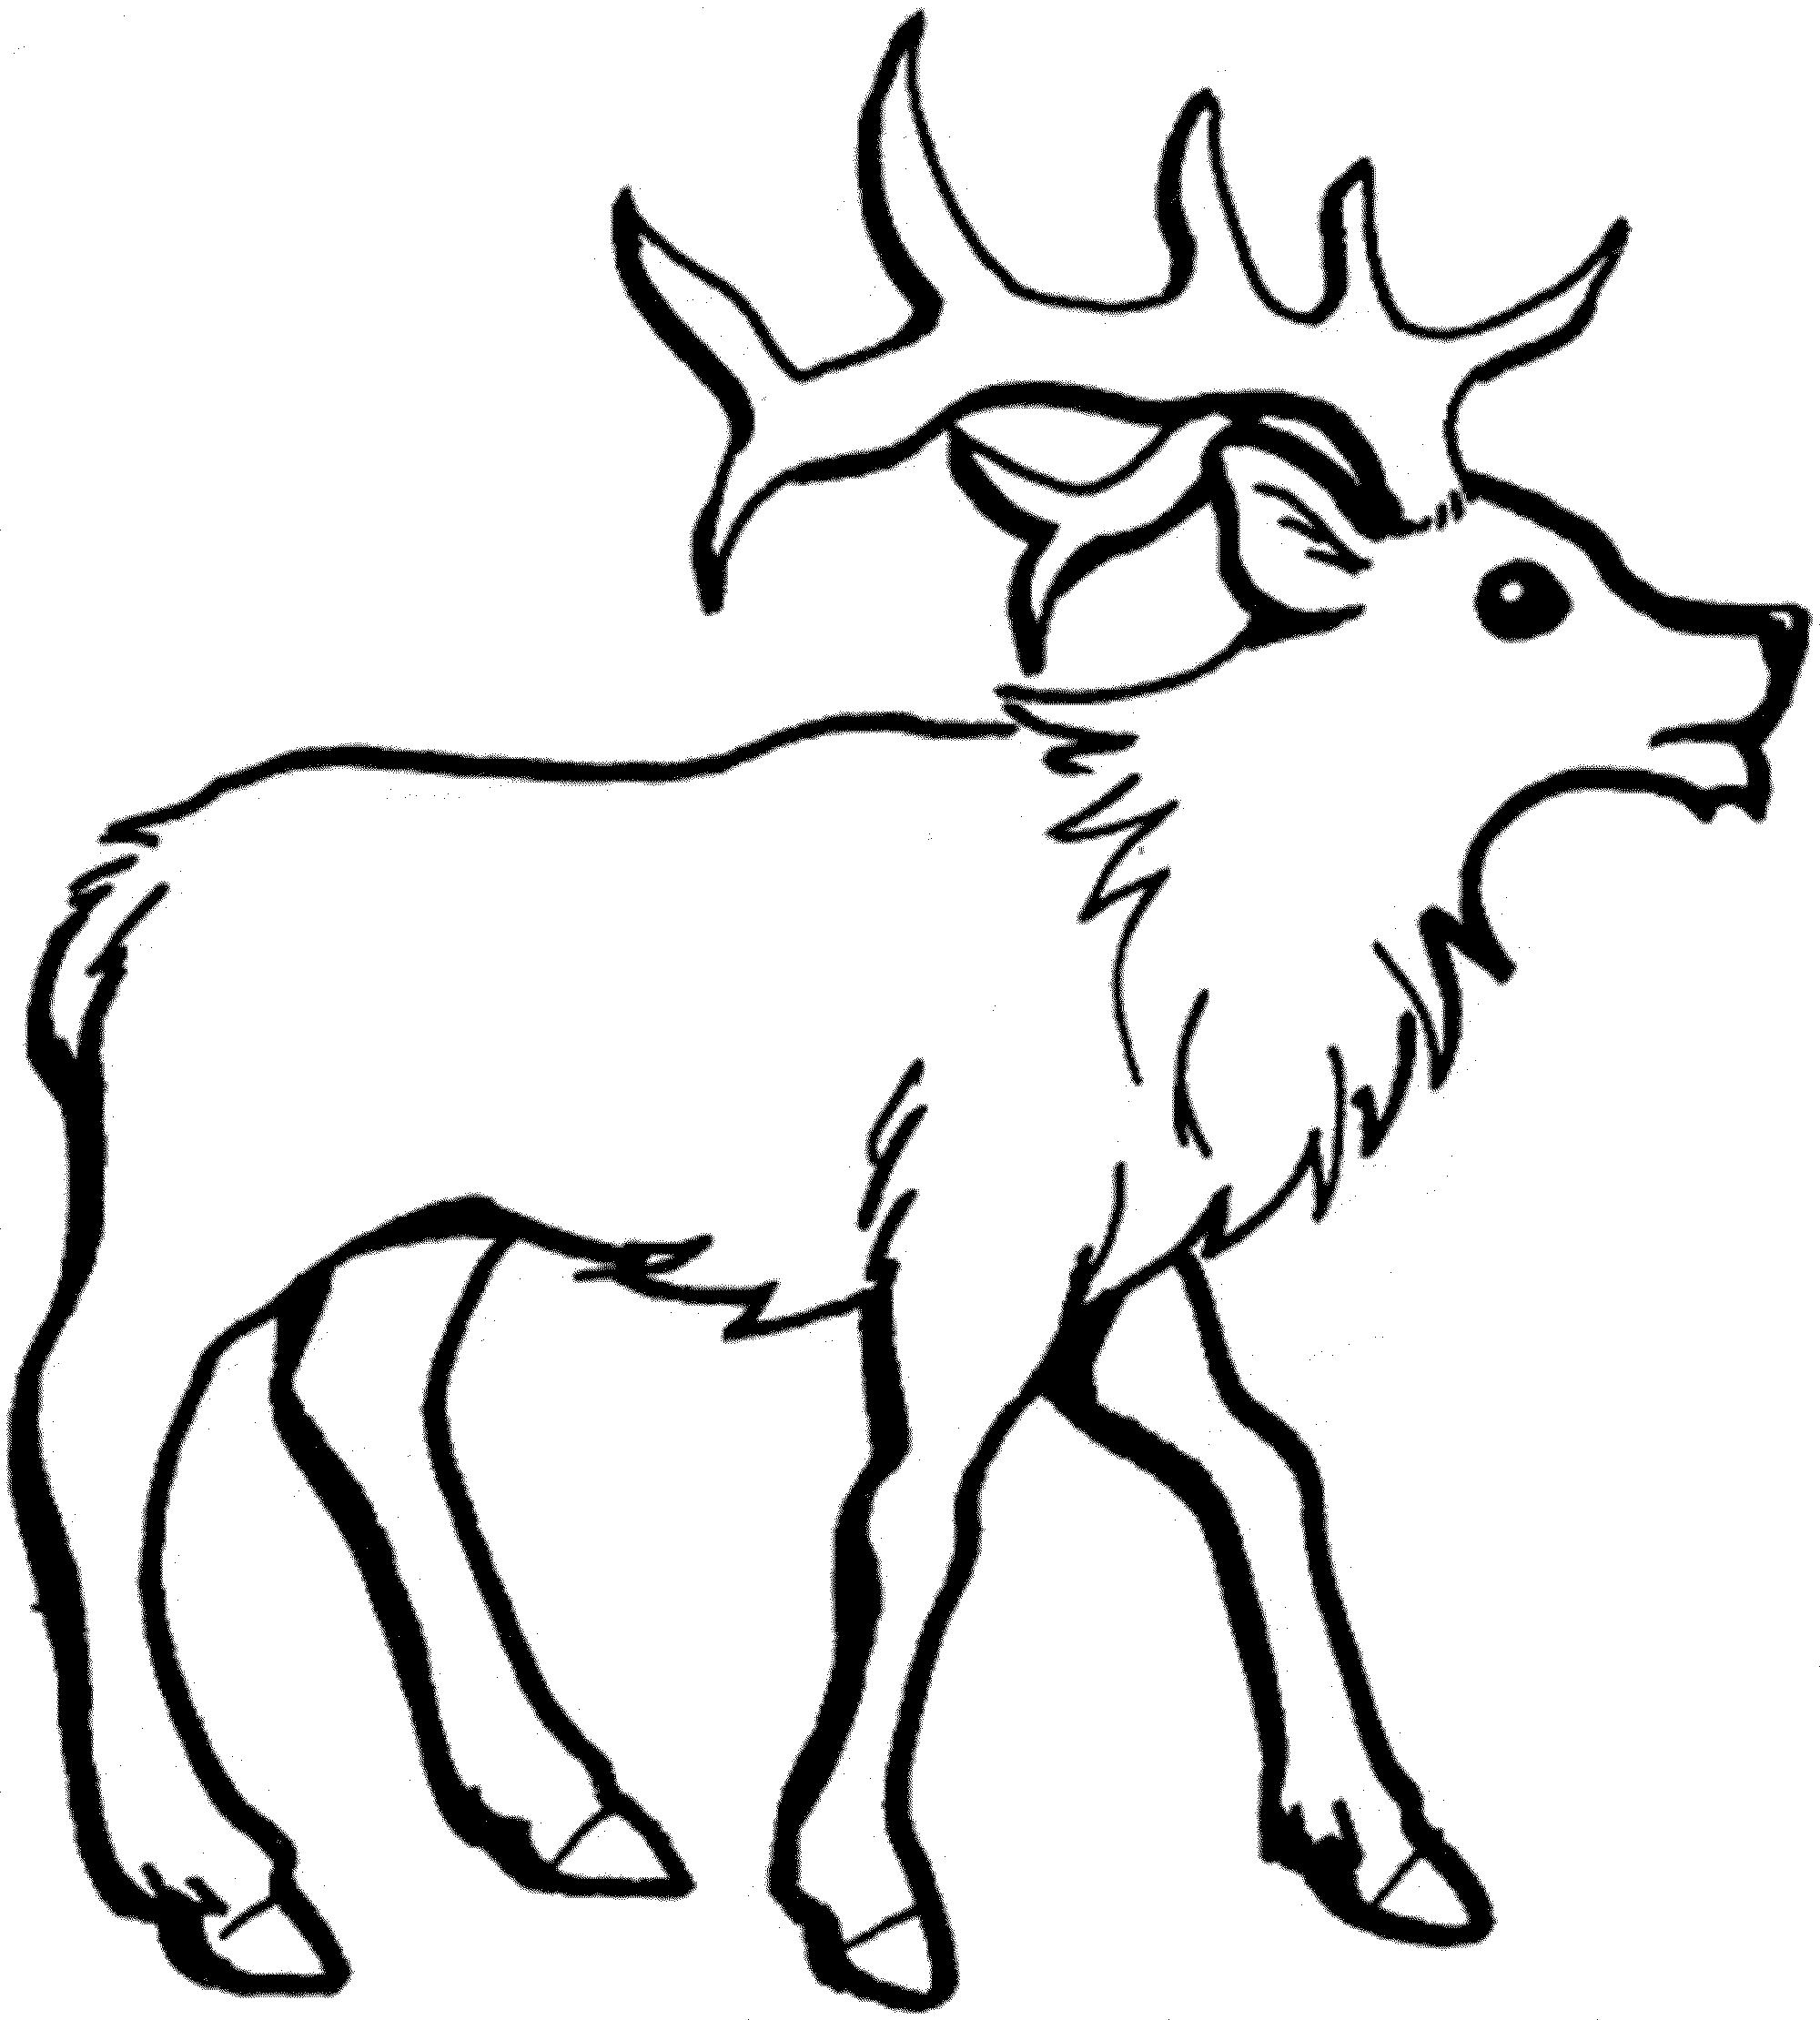 photograph regarding Printable Reindeer Antler named Reindeer Antlers Drawing at  Absolutely free for